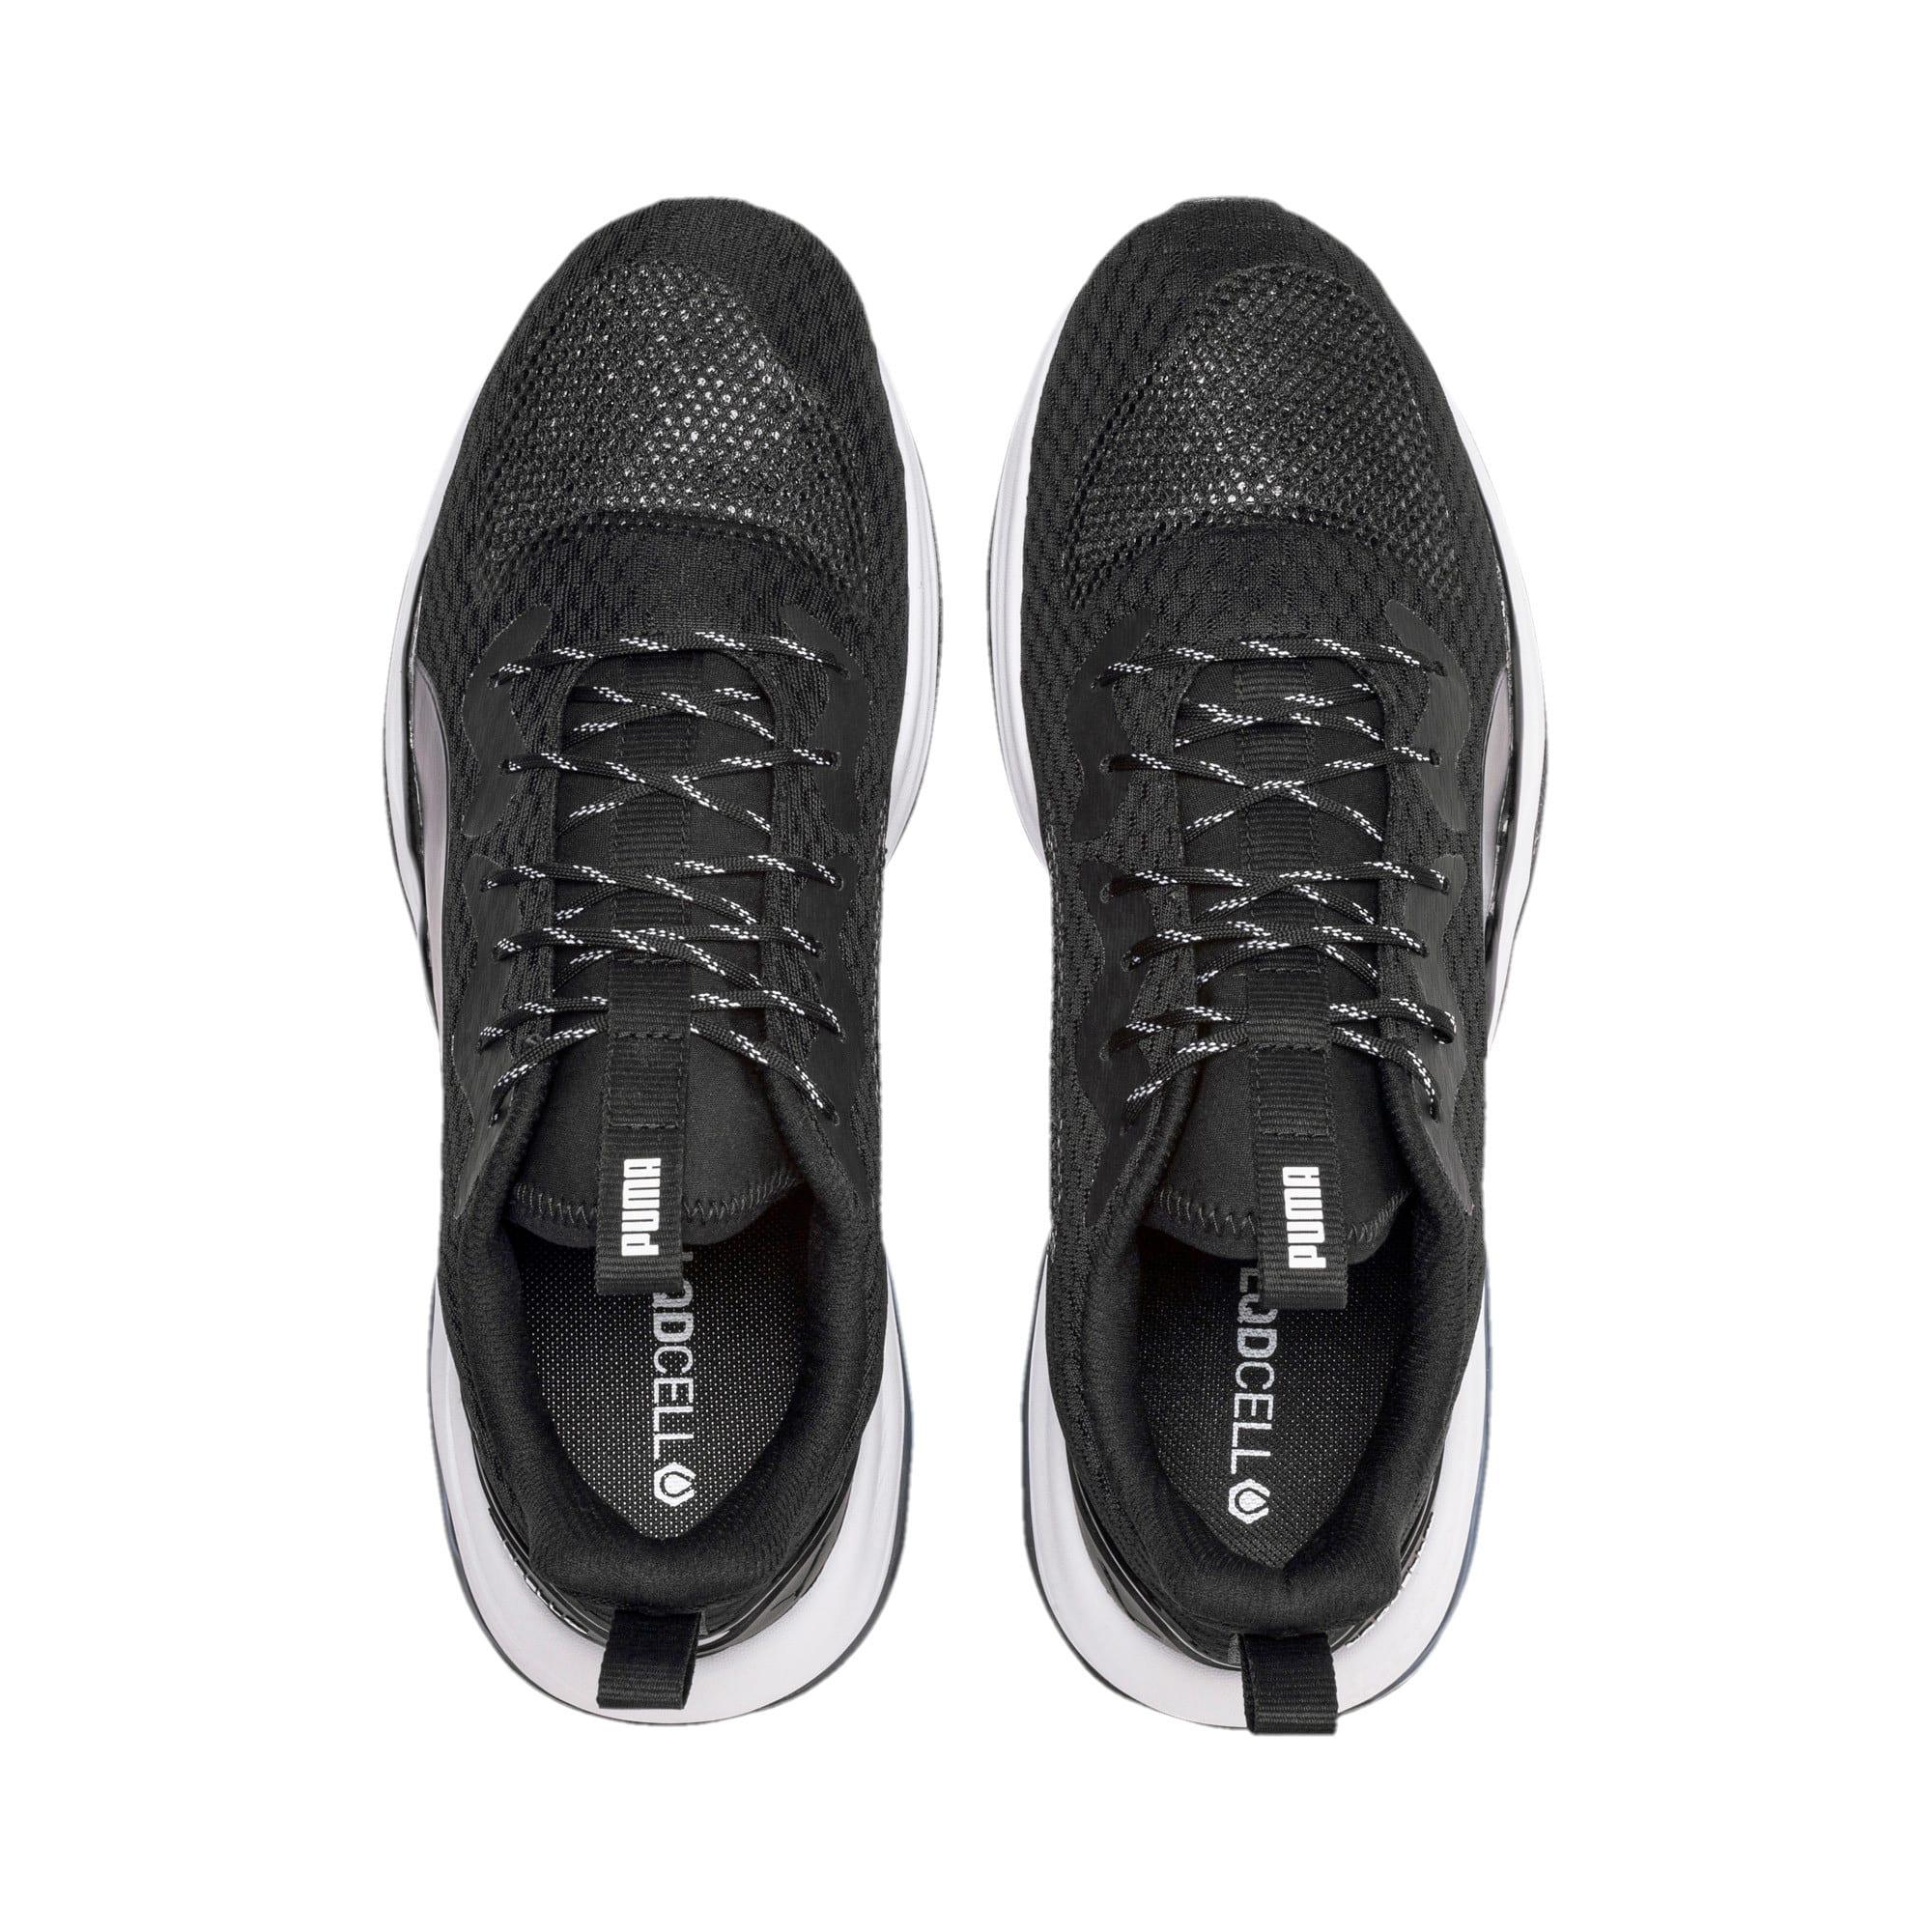 Thumbnail 9 of LQDCELL Tension Men's Training Shoes, Puma Black-Puma White, medium-IND